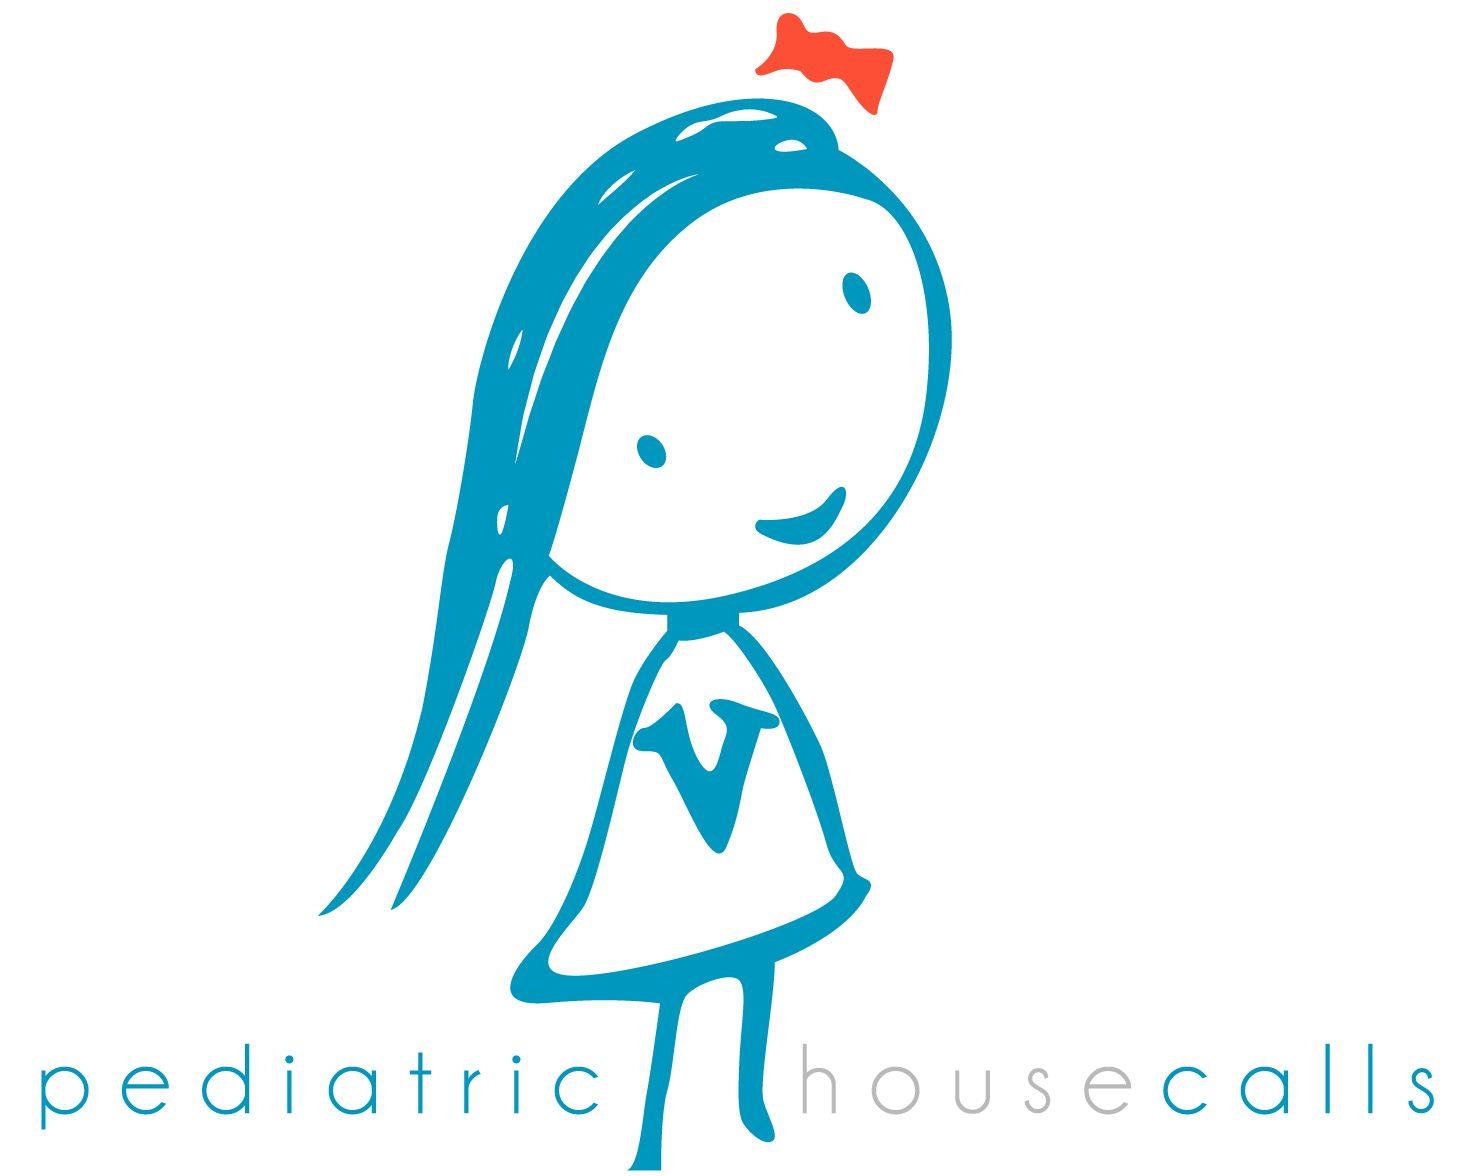 Pediatric Housecalls